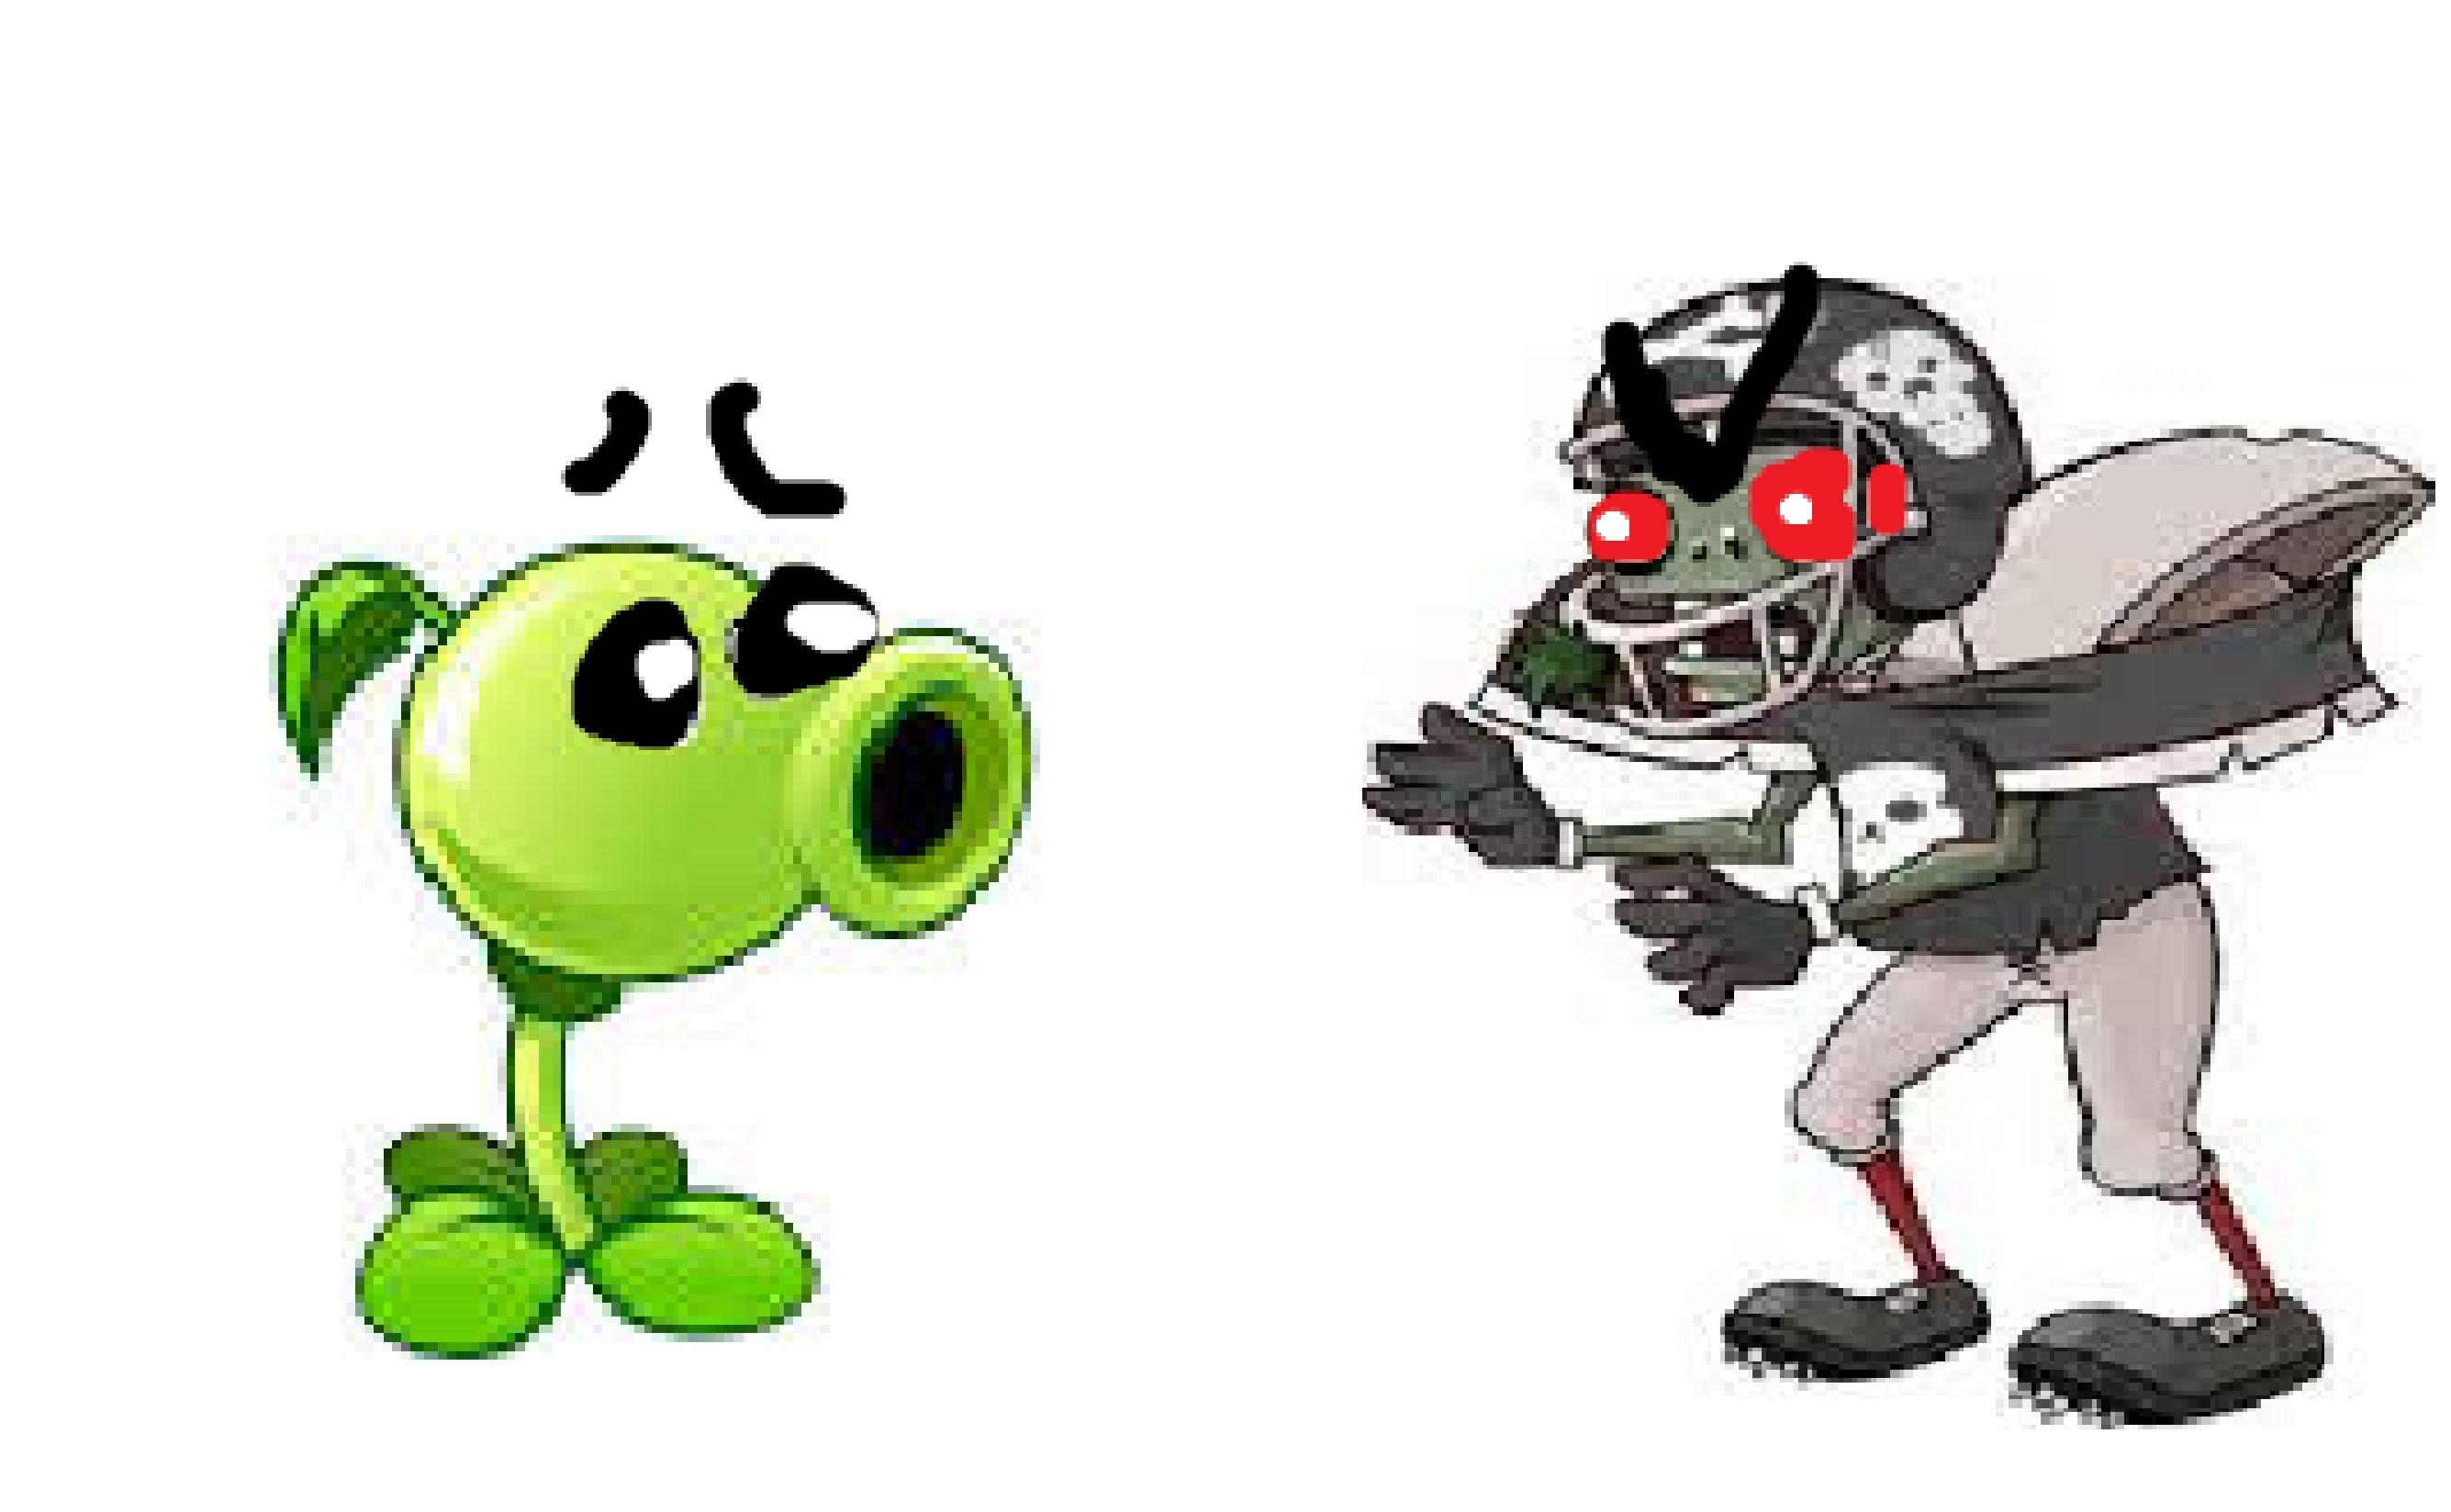 Zombie clipart football Black/Giga VS Black/Giga peashooter and